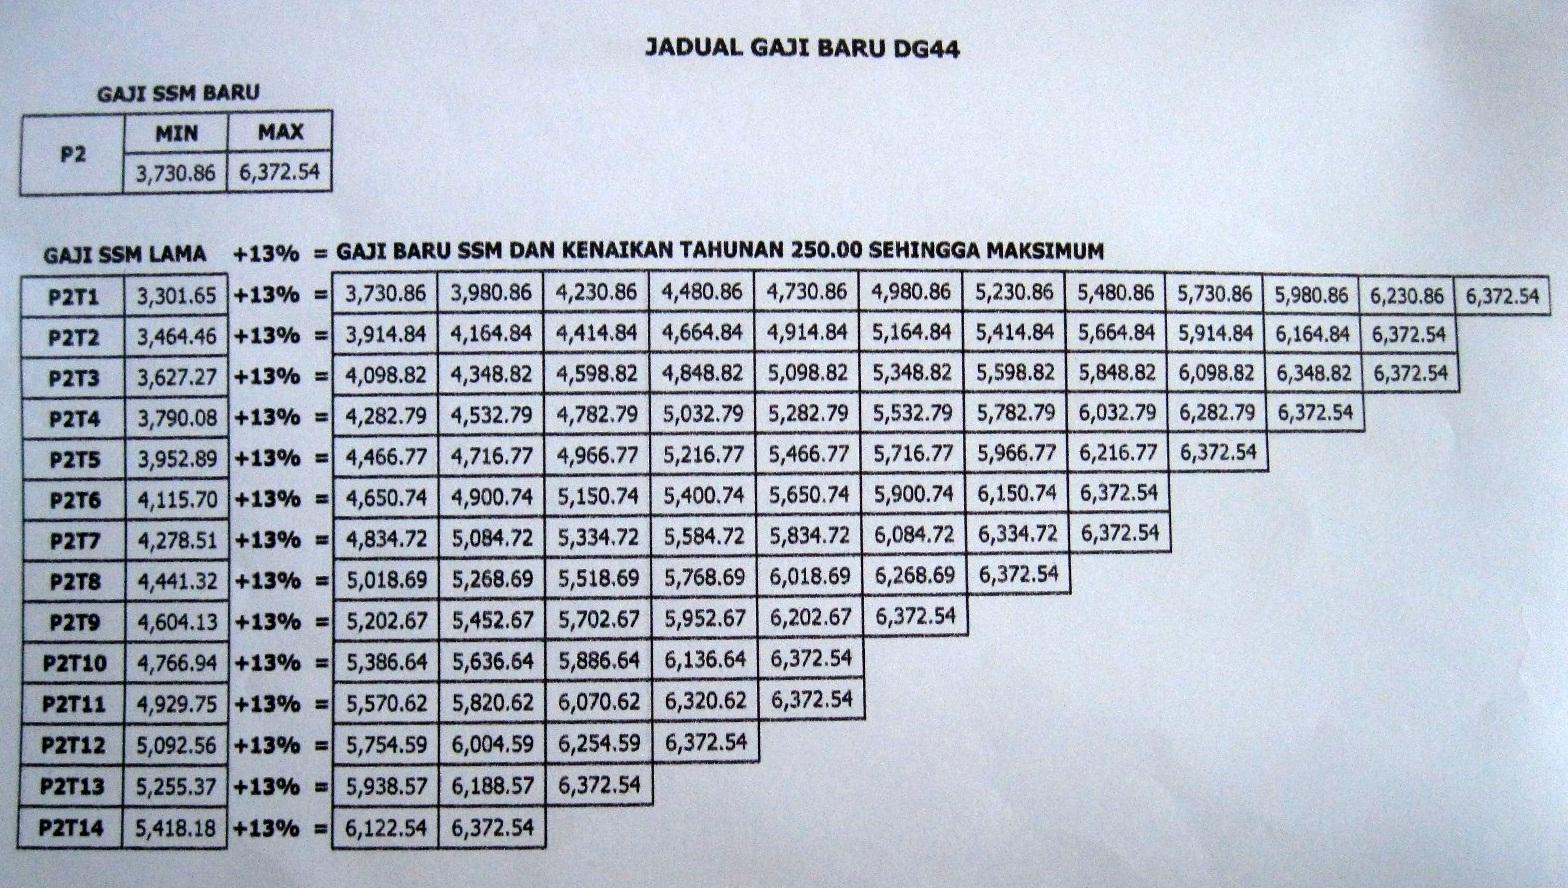 Gaji DG 41 http://www.ciklaili.com/2012/03/jadual-gaji-ssm-2012-bagi